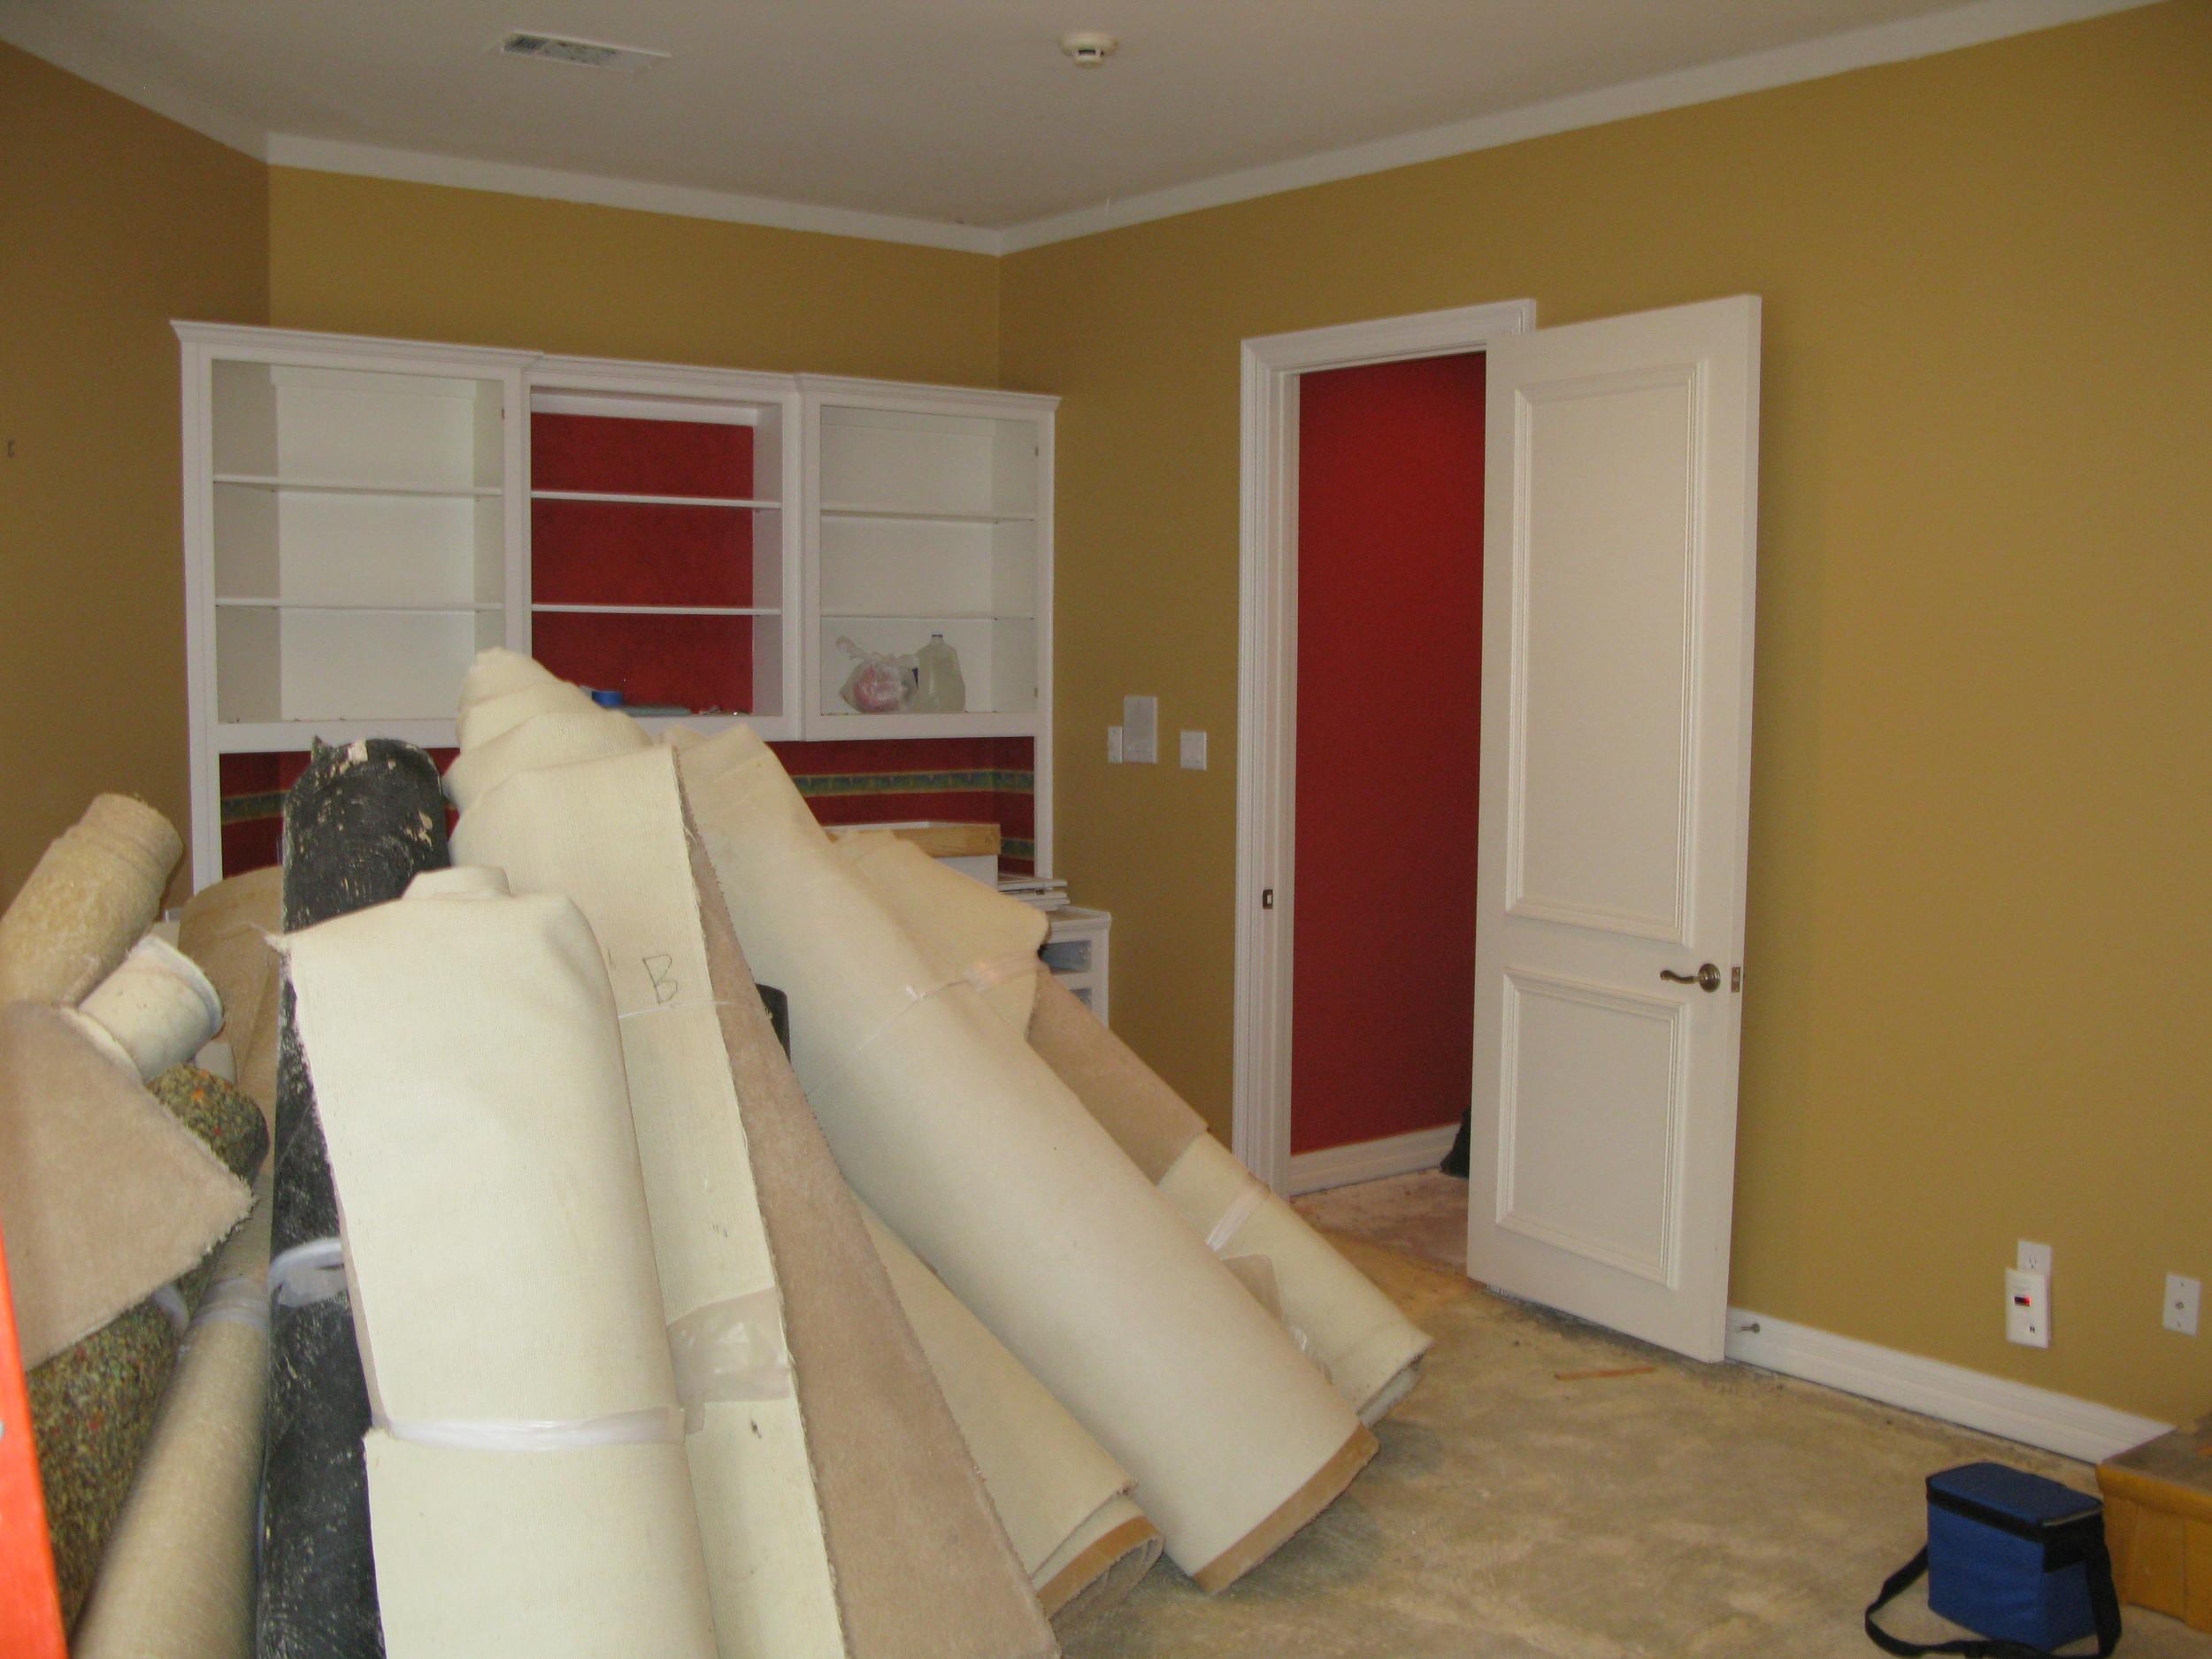 Strait Lane Estates Boy's Room Before